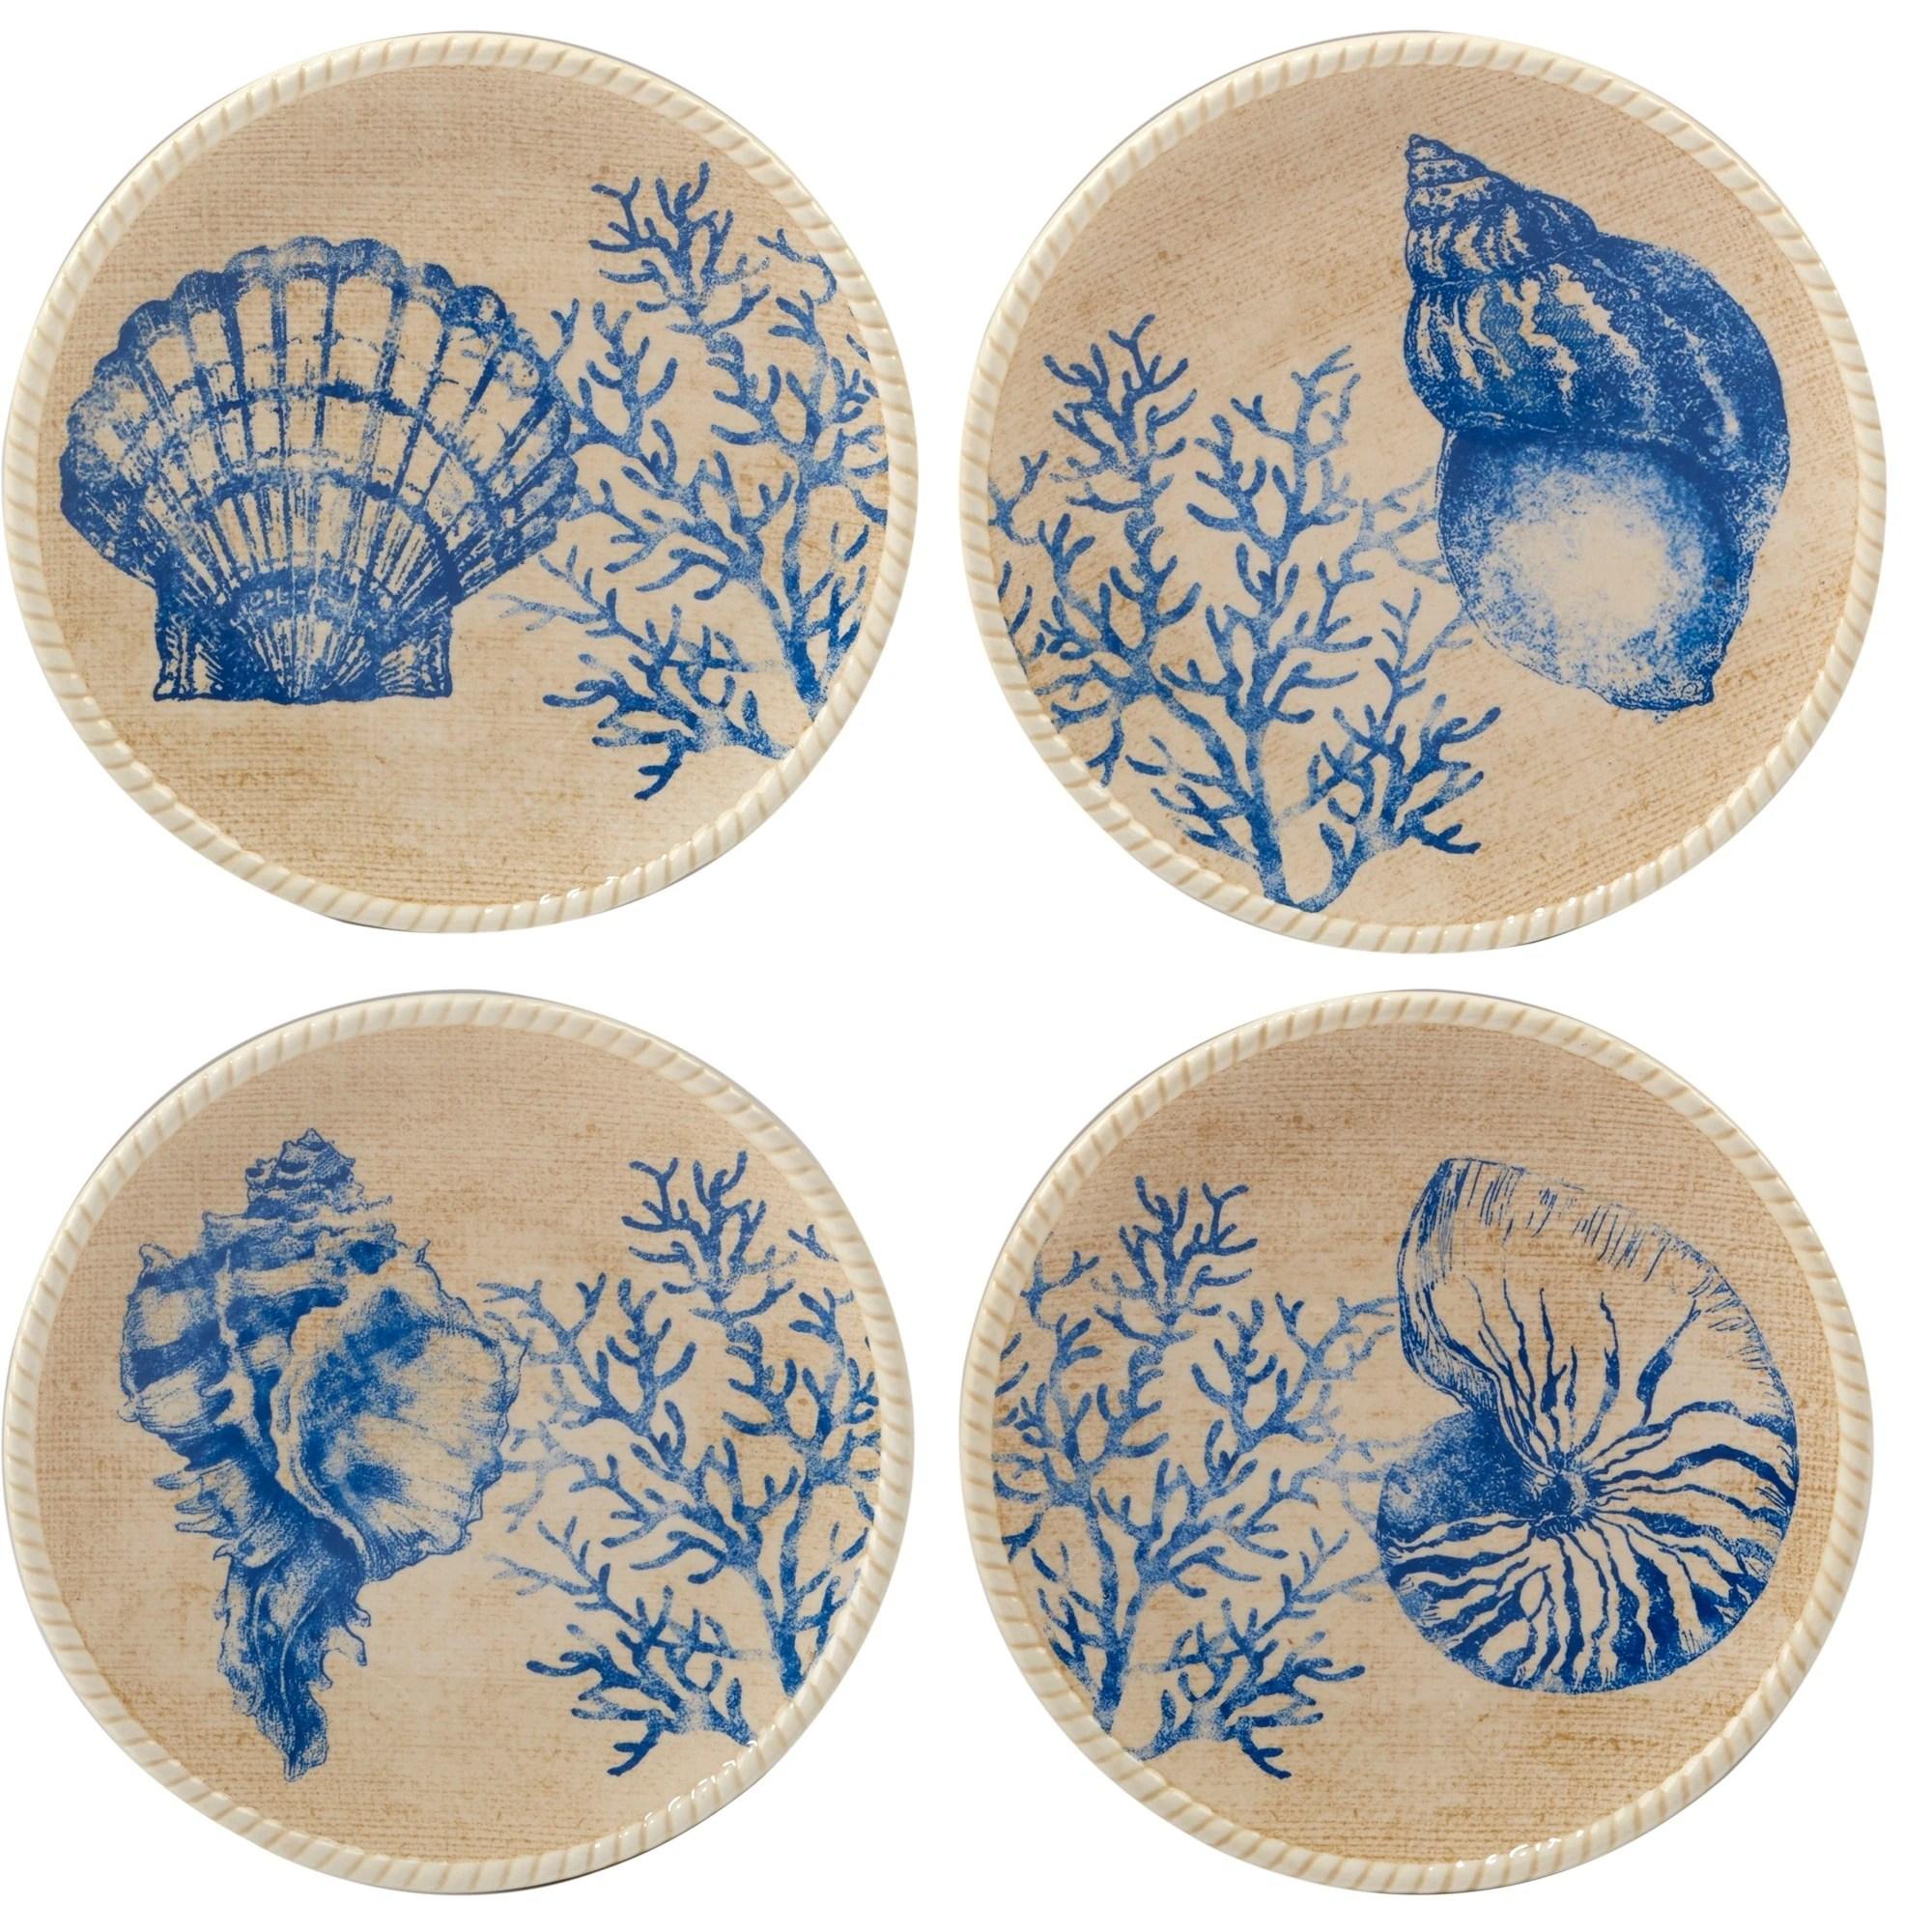 buy blue plates online